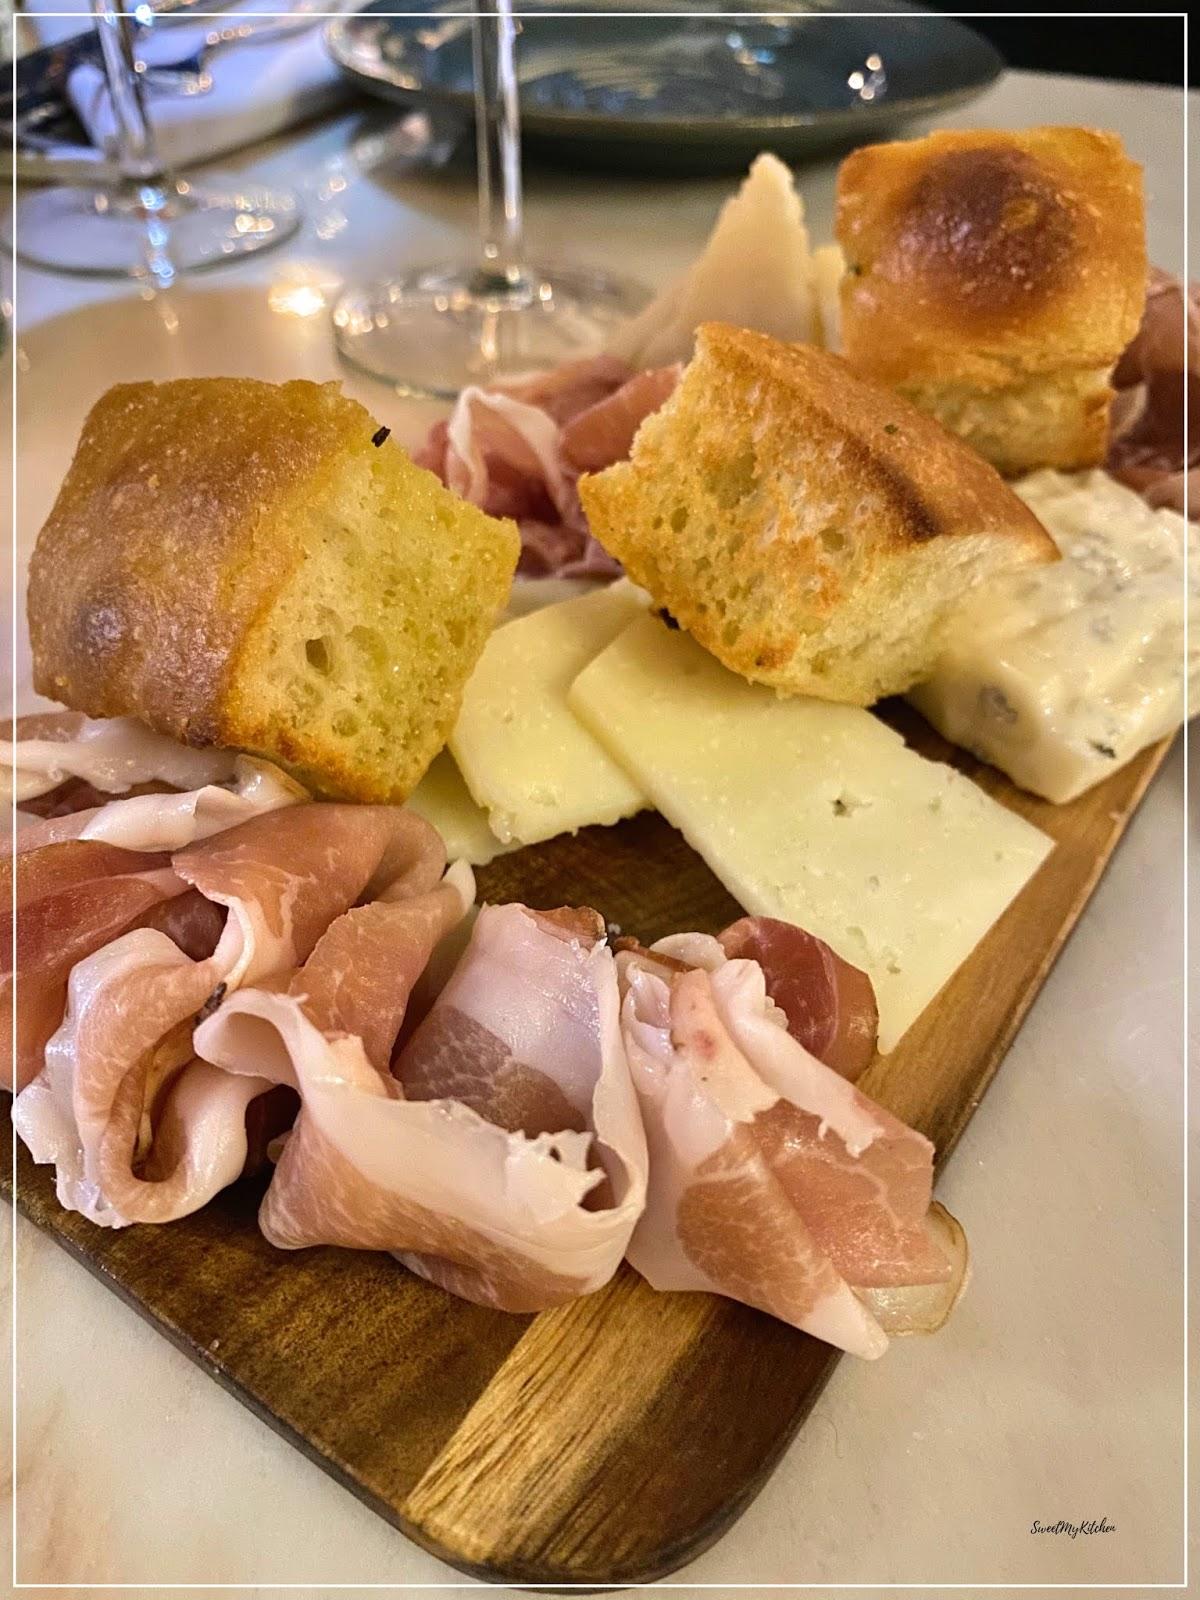 Visconti Chiado tábua mista queijos enchidos focaccia